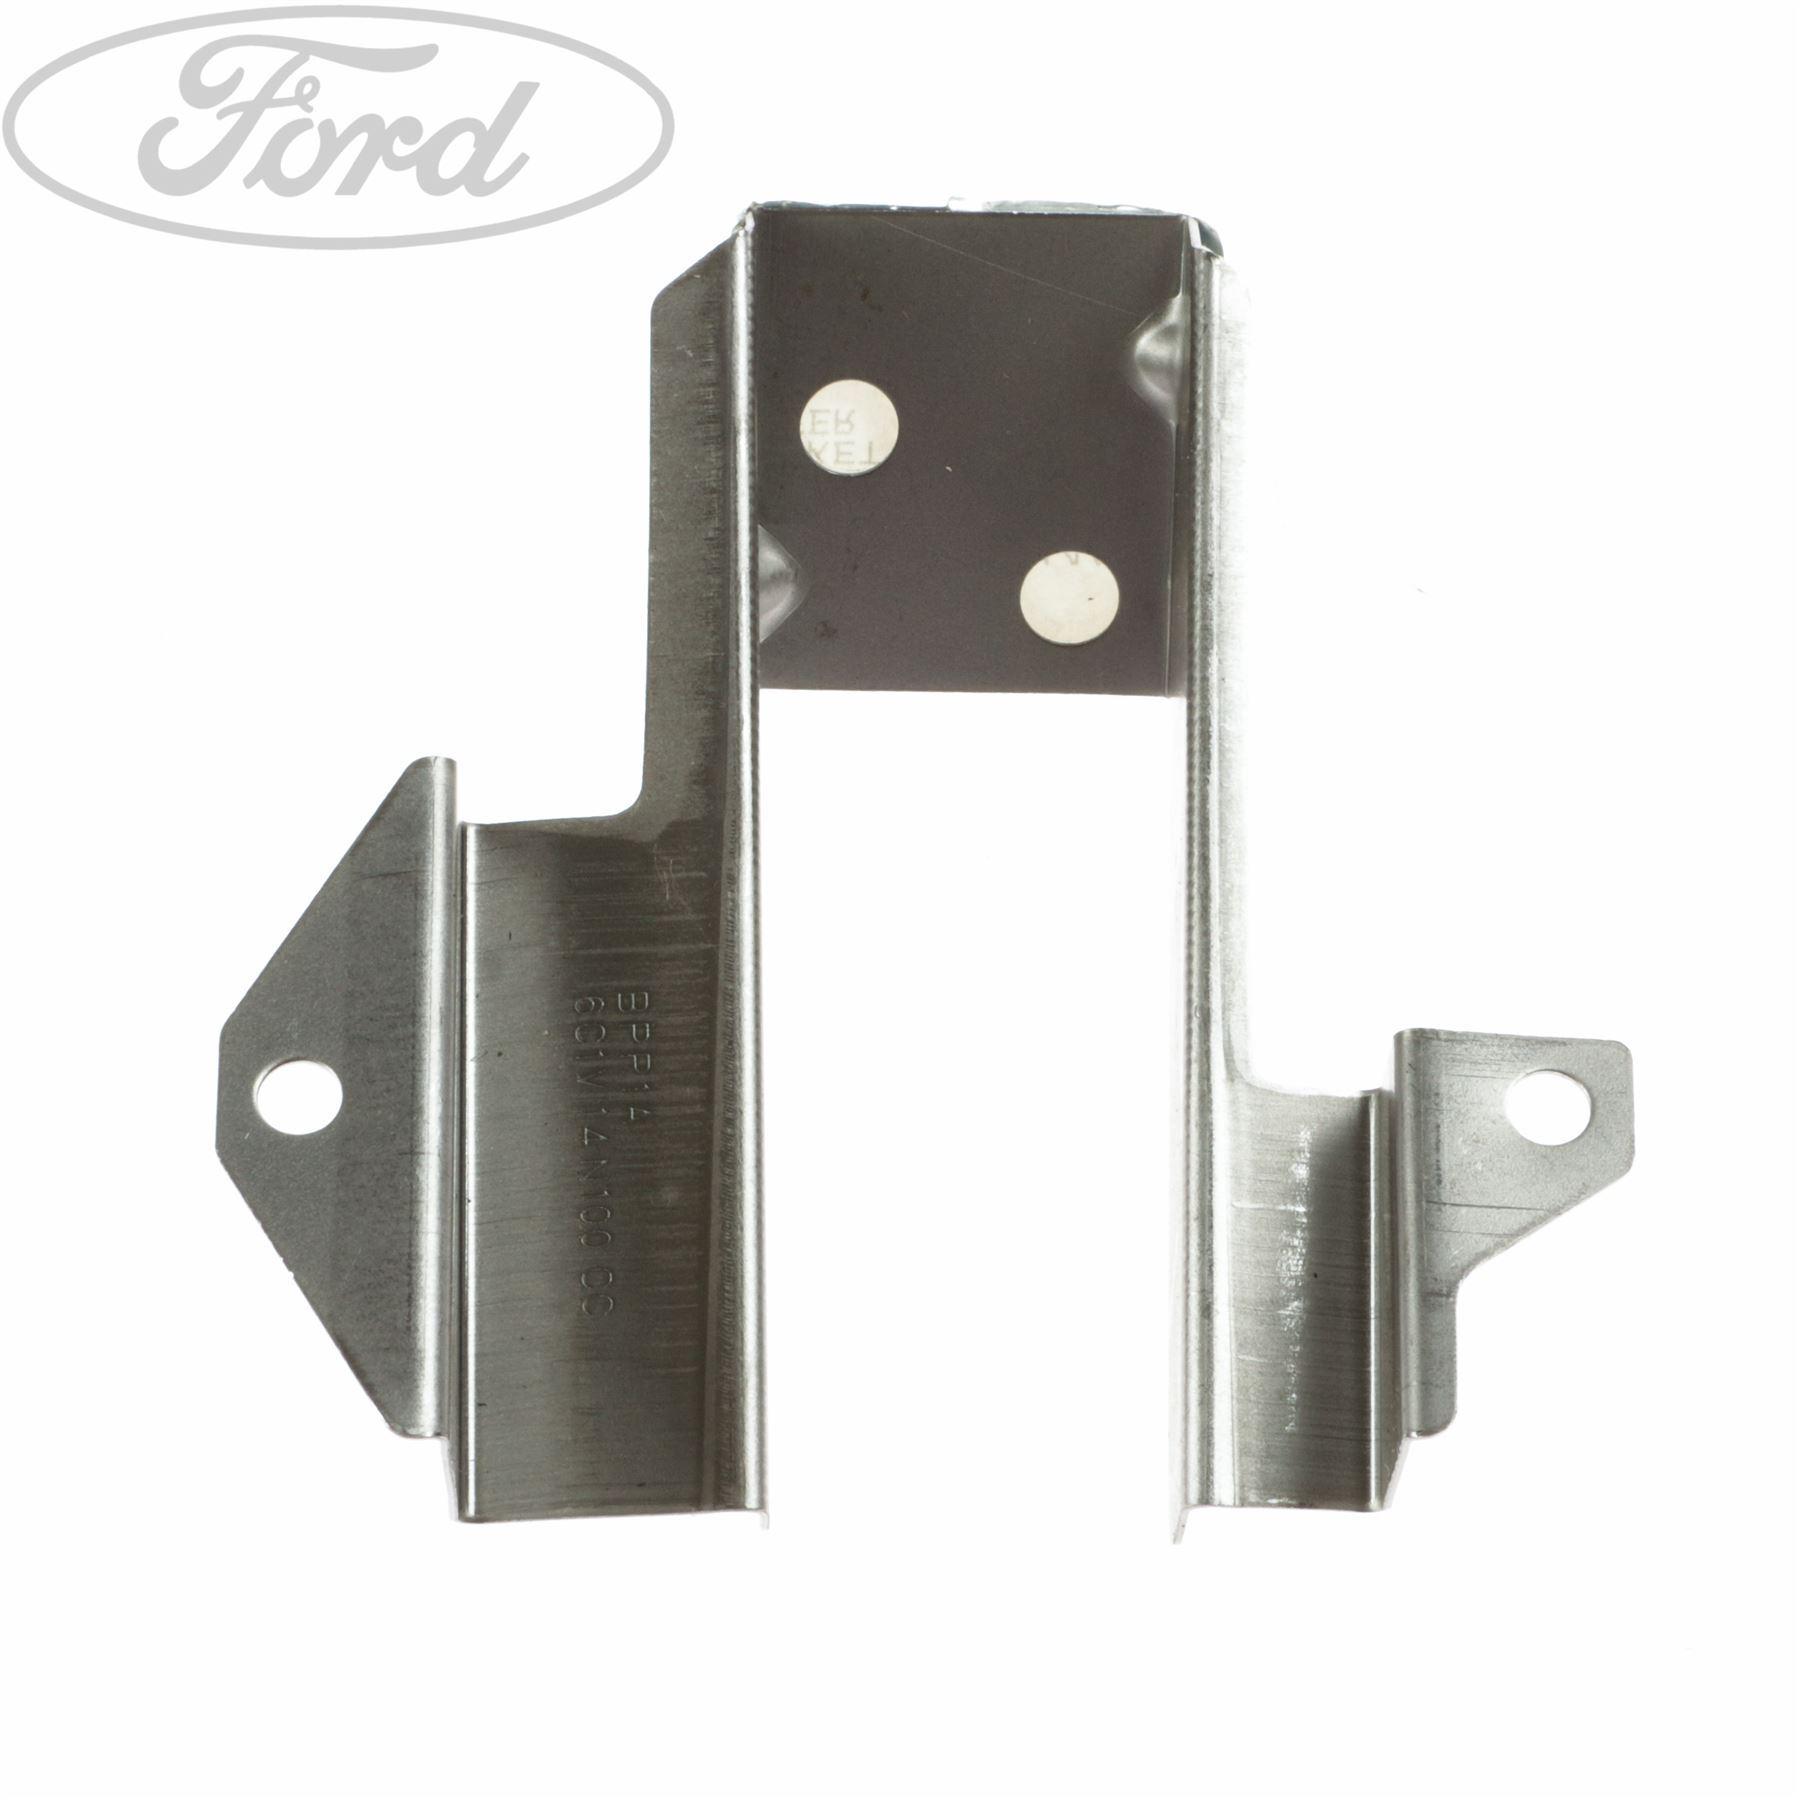 hight resolution of details about genuine ford transit mk 7 fuse box holder bracket 1460312